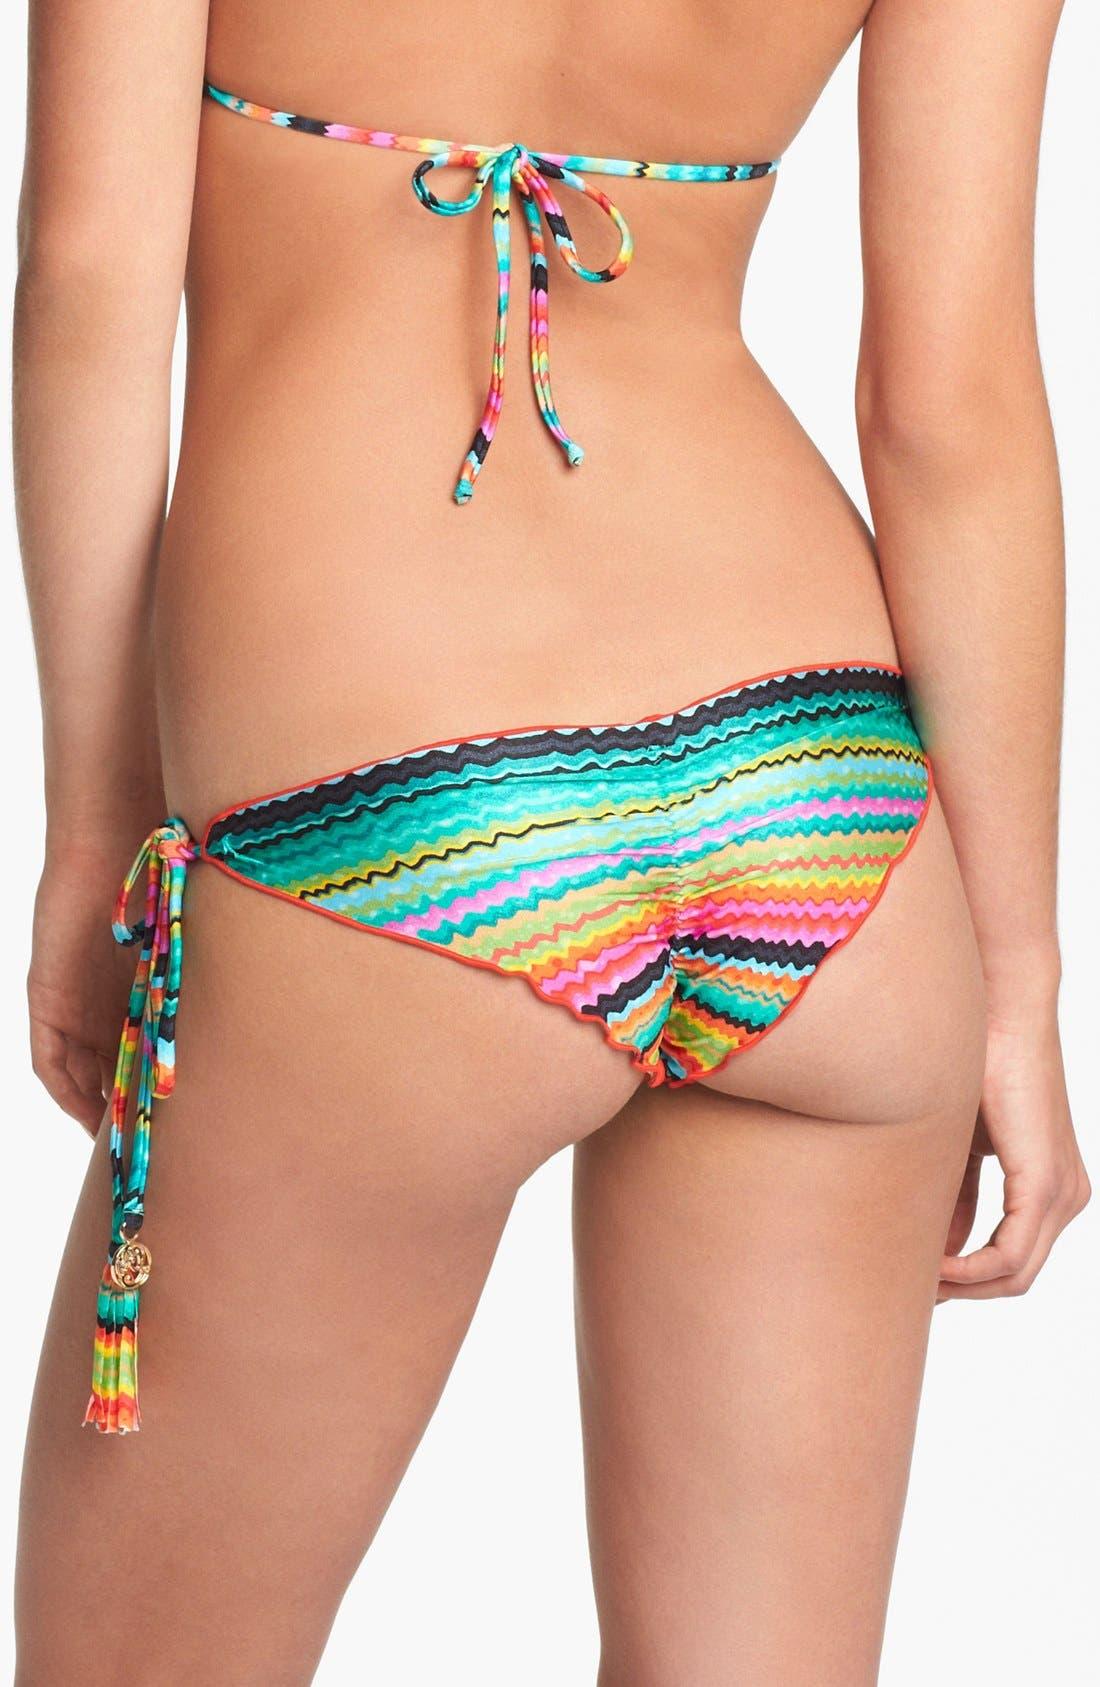 Main Image - Luli Fama 'Hola Verano' Side Tie Bikini Bottoms